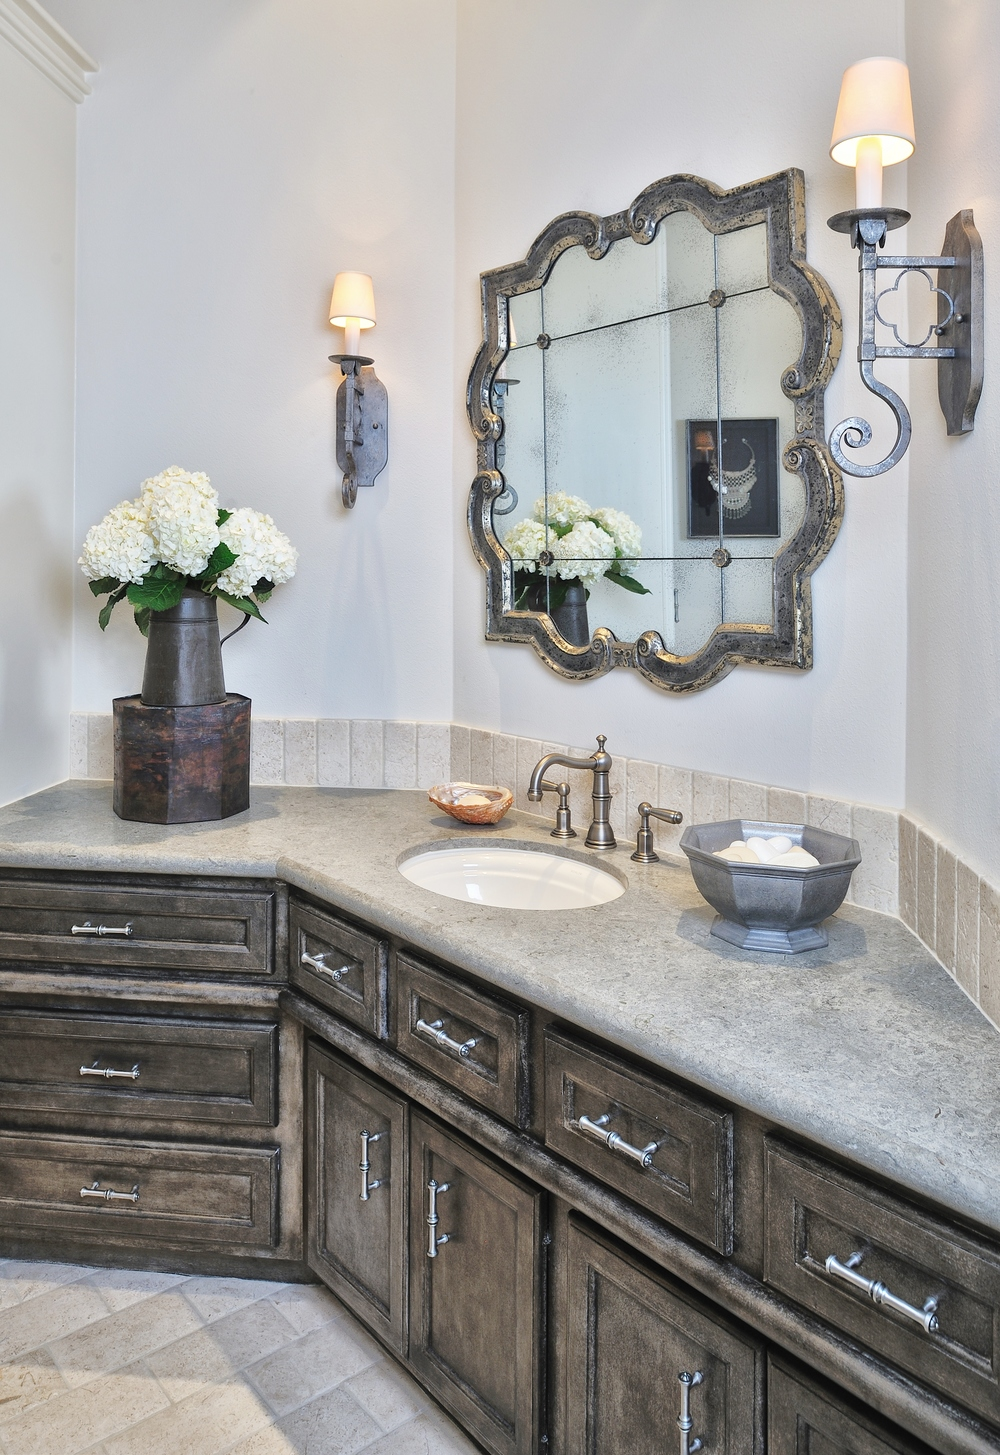 Guest Bath - A Home Full of Treasures